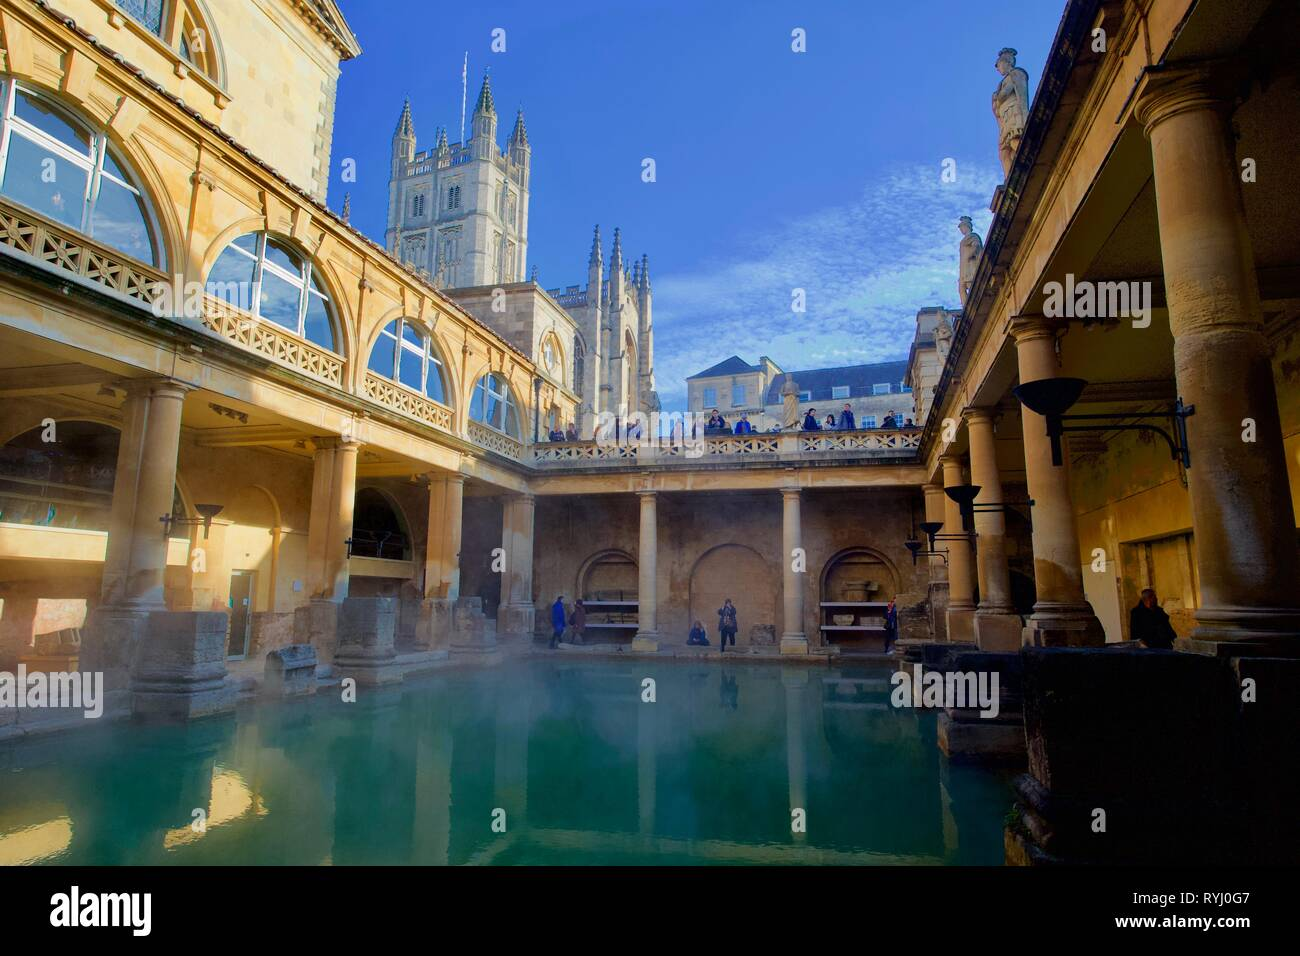 Roman Baths, Bath,Somerset, England - Stock Image